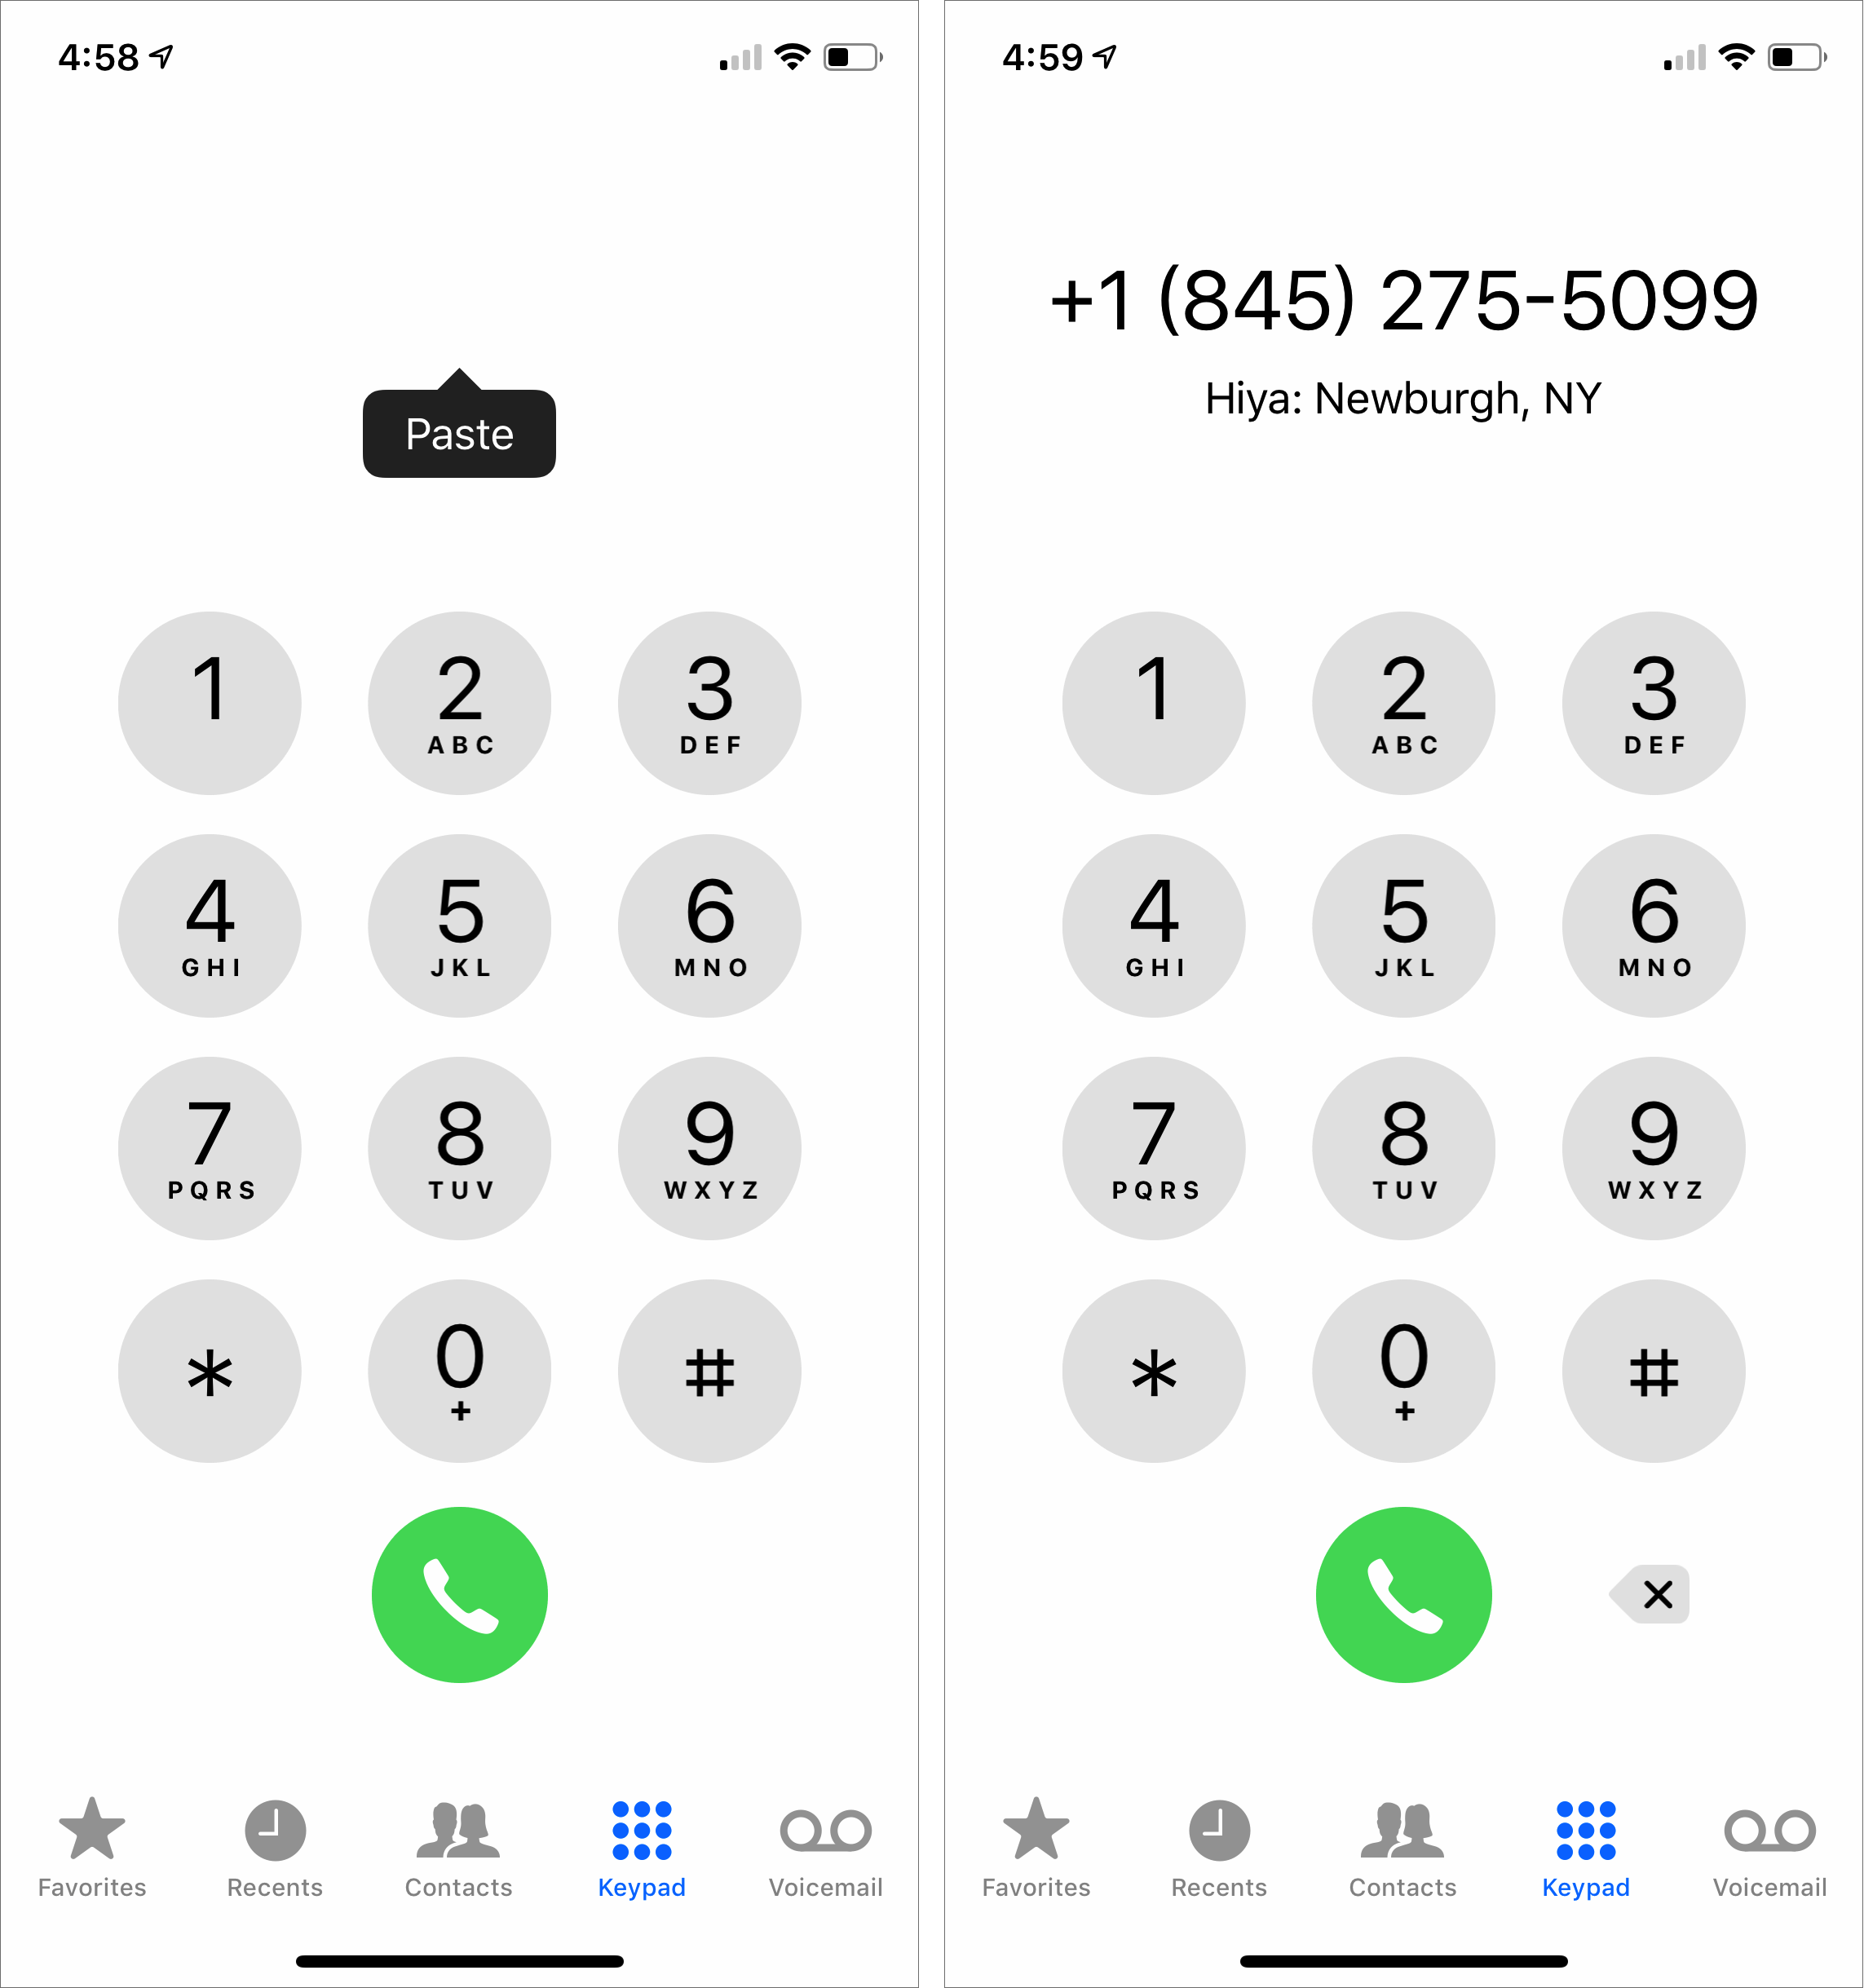 Paste-phone-numbers.png